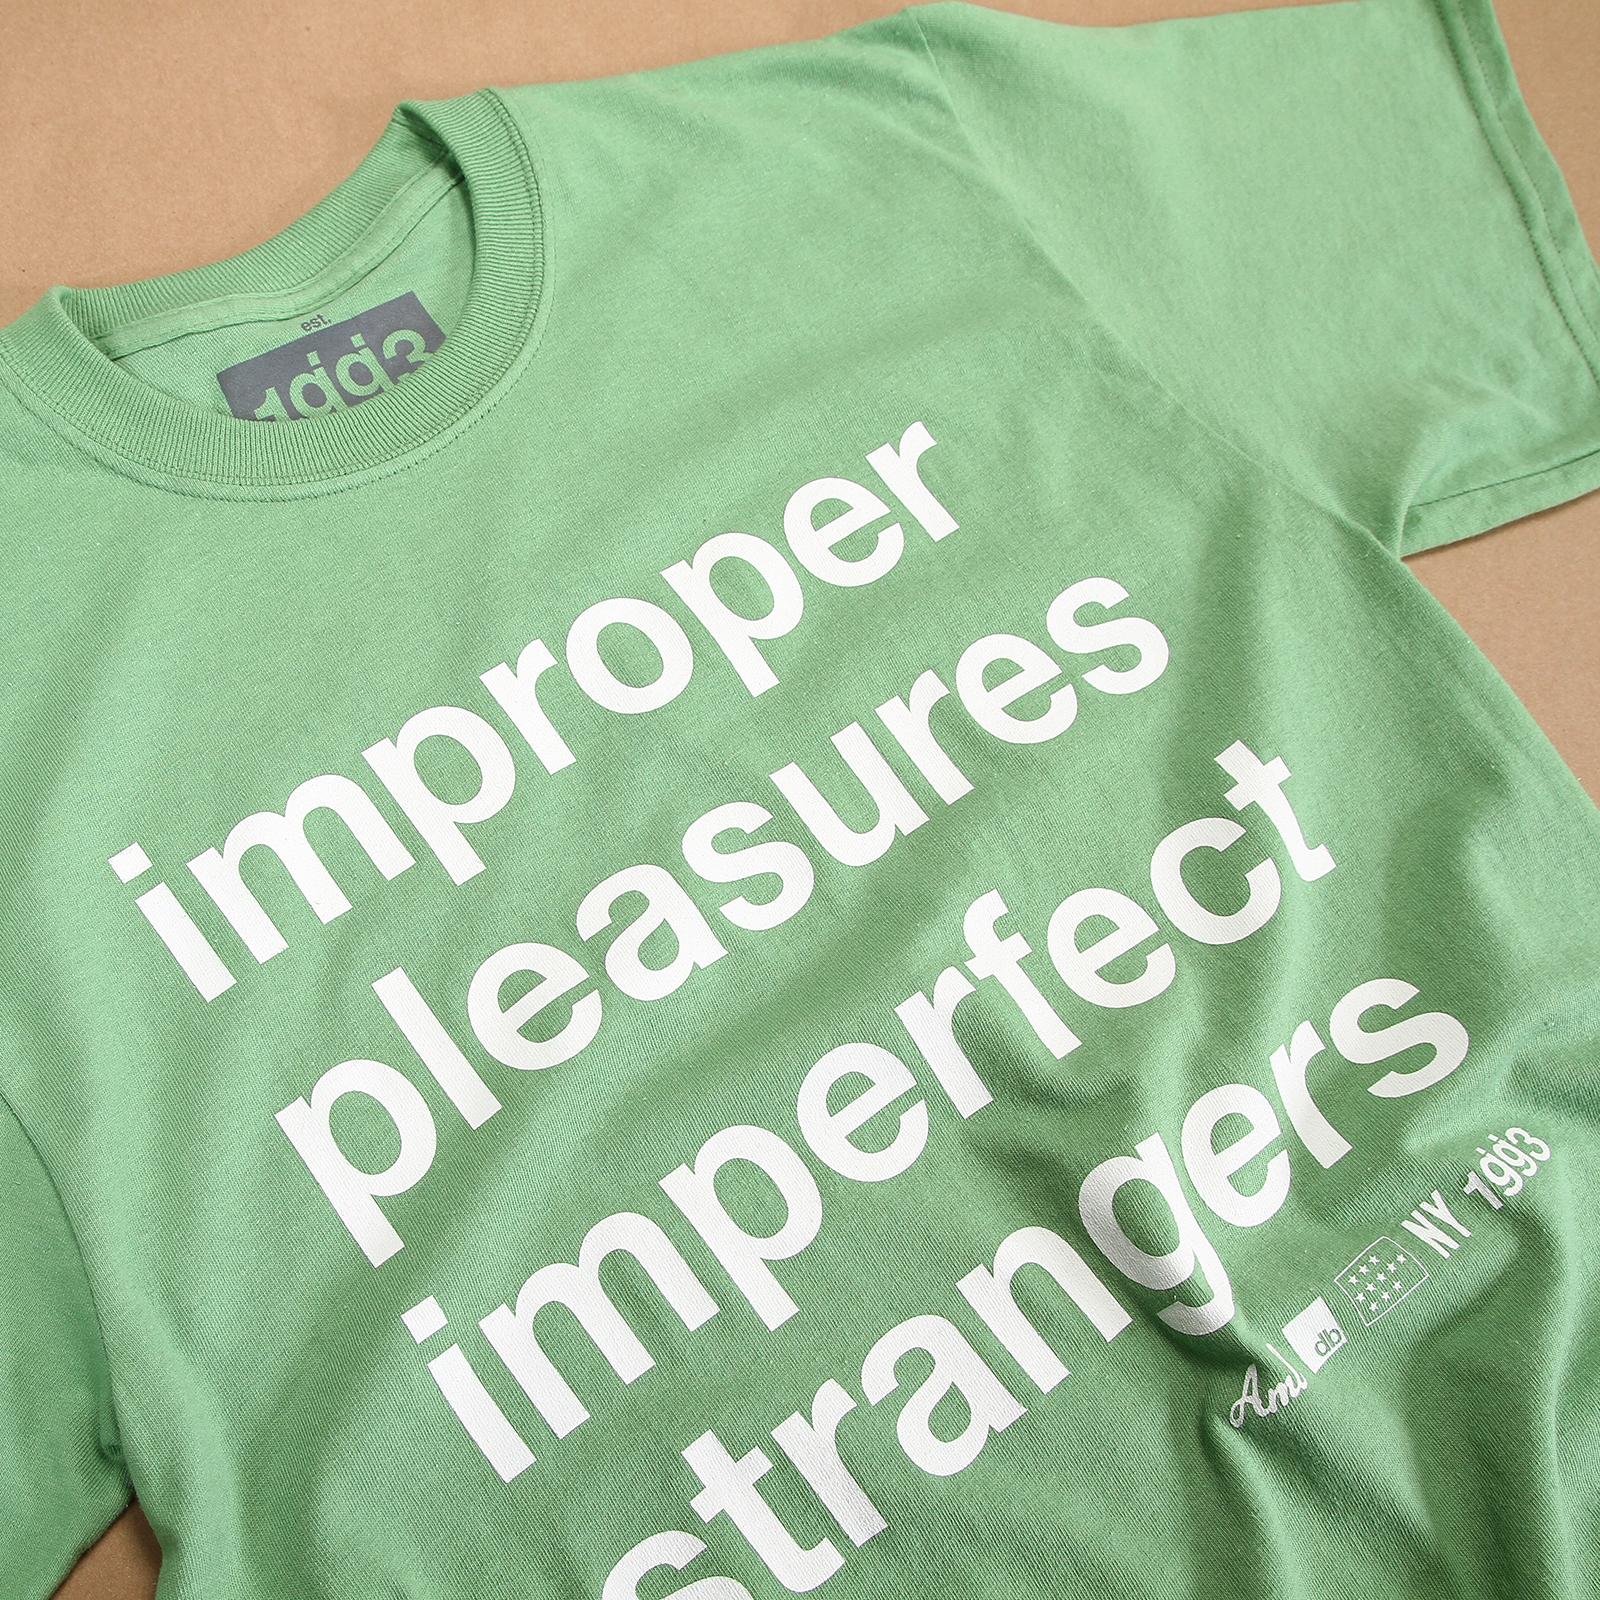 Imperfect Strangers Bundle